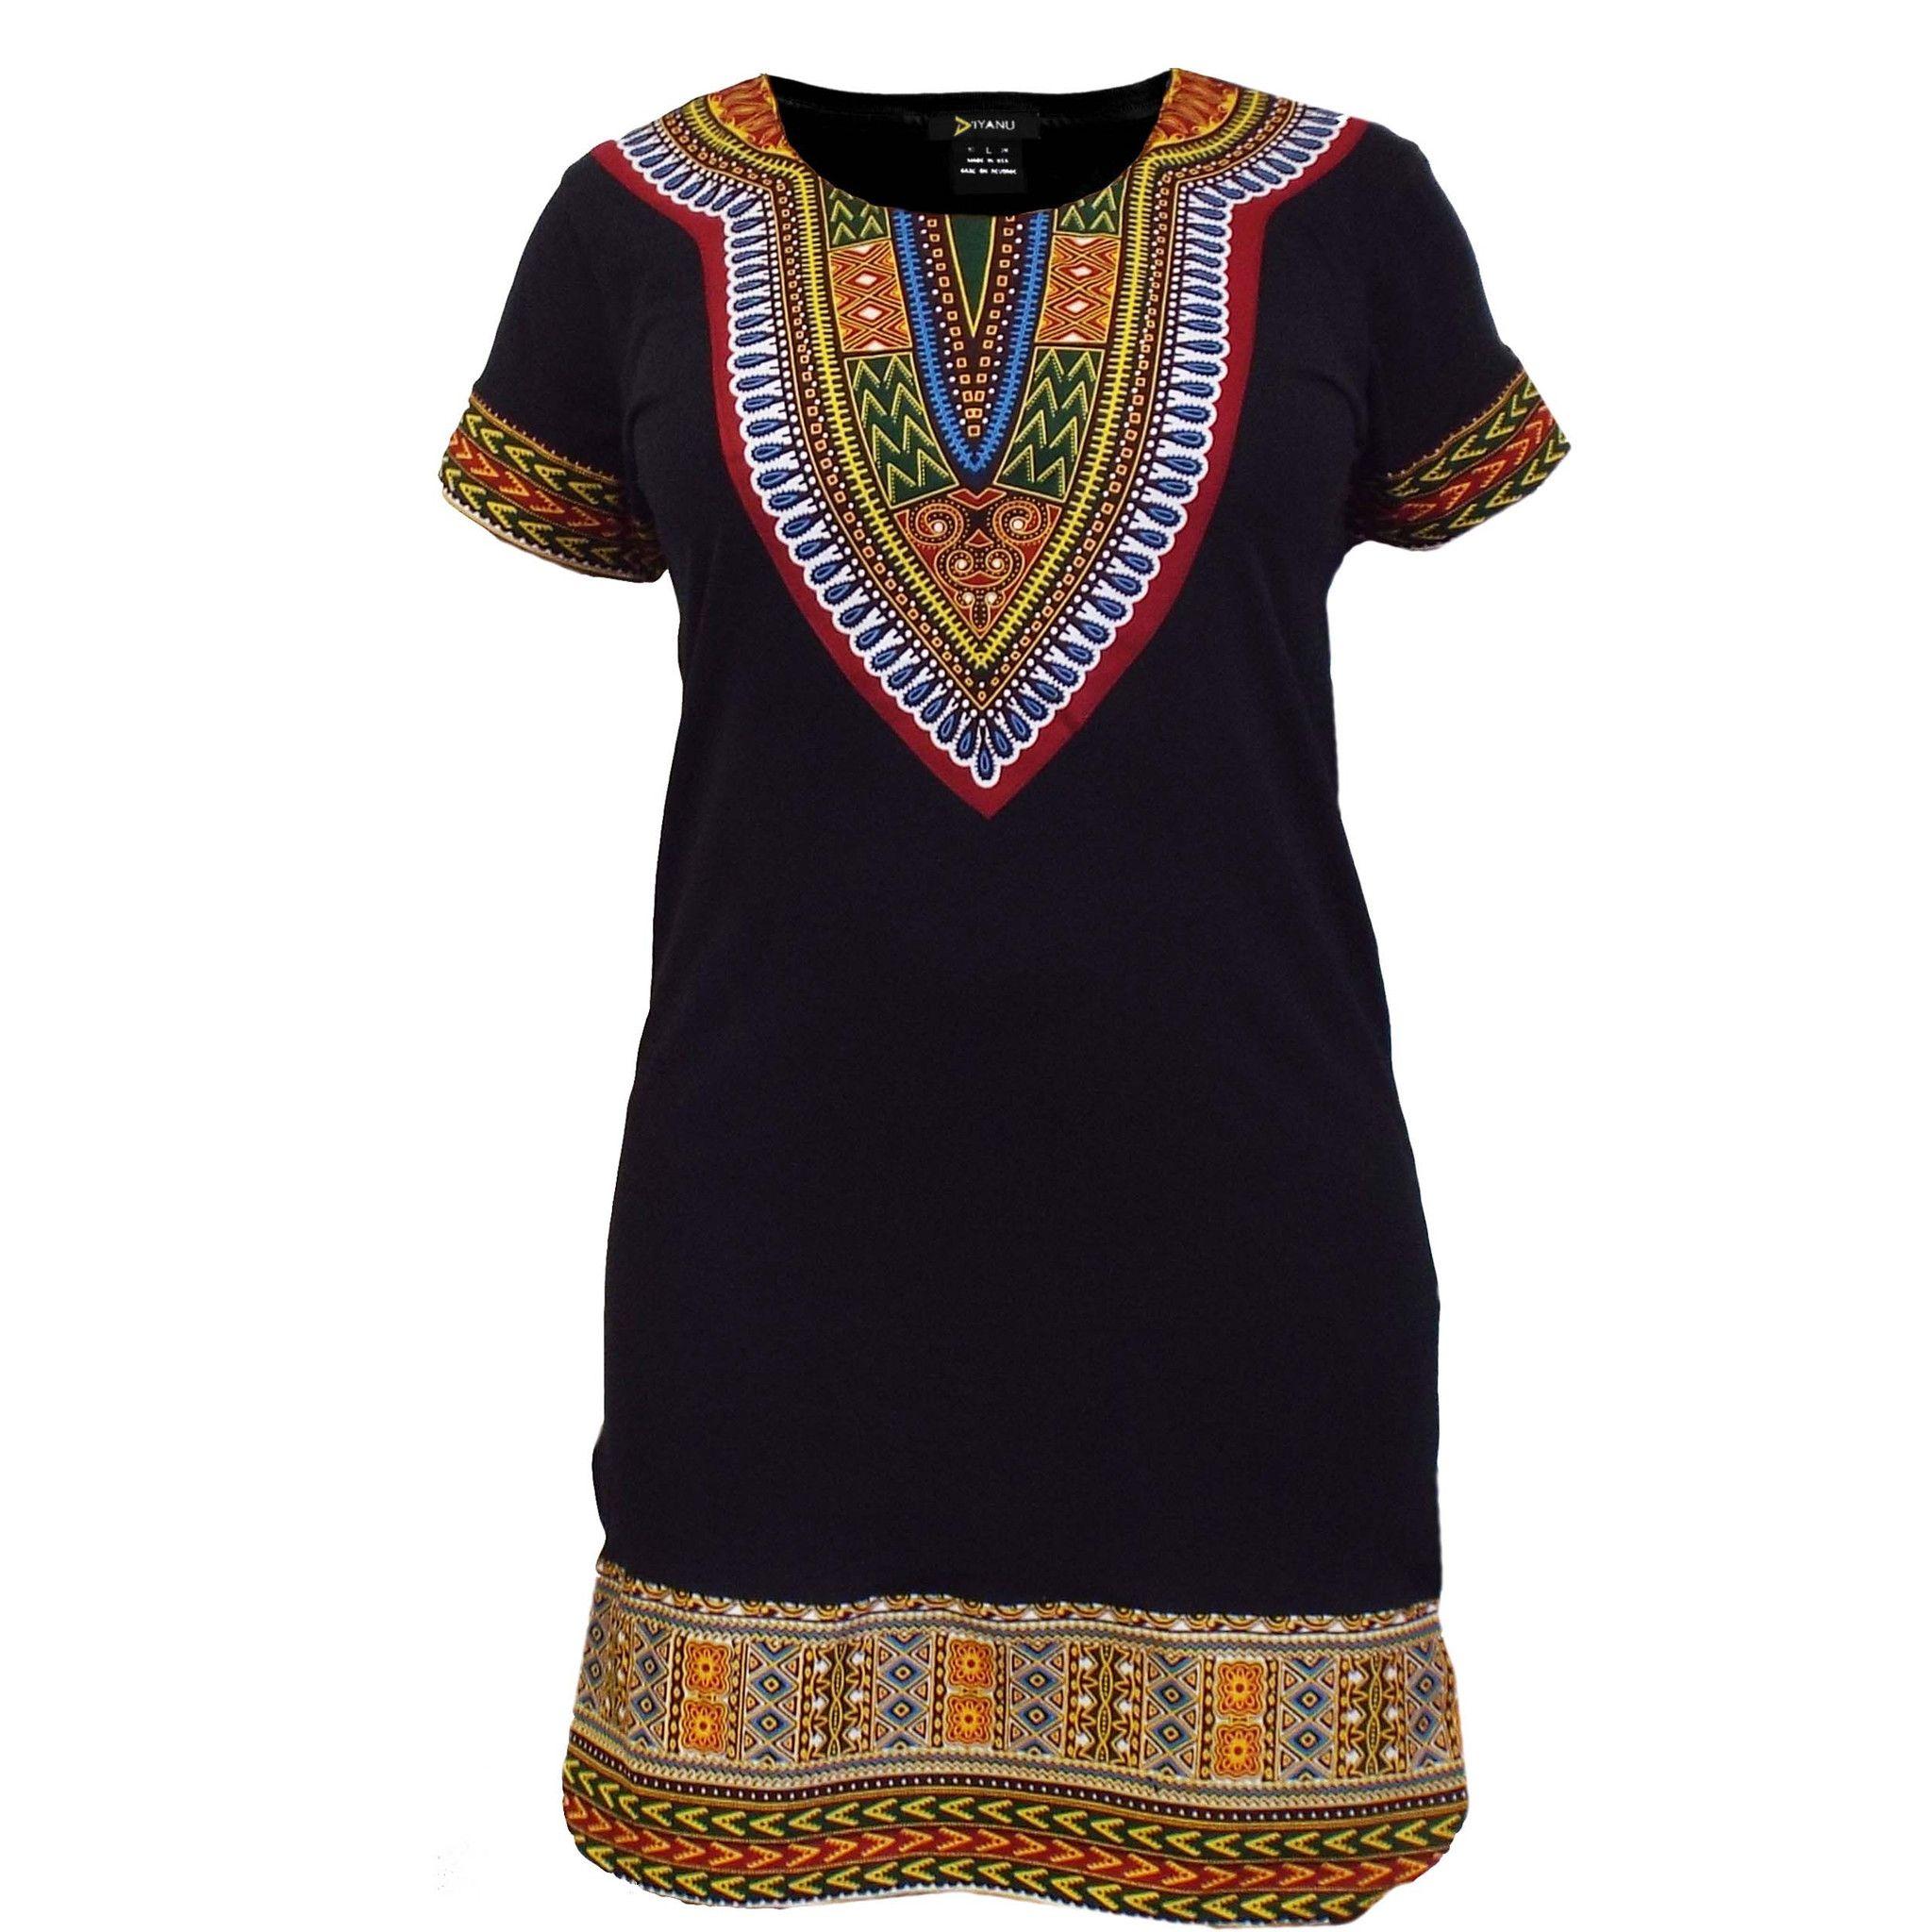 d2a1ee1c6cd NEW Women s Fitted Dashiki African Print T-Shirt Dress (Black ...